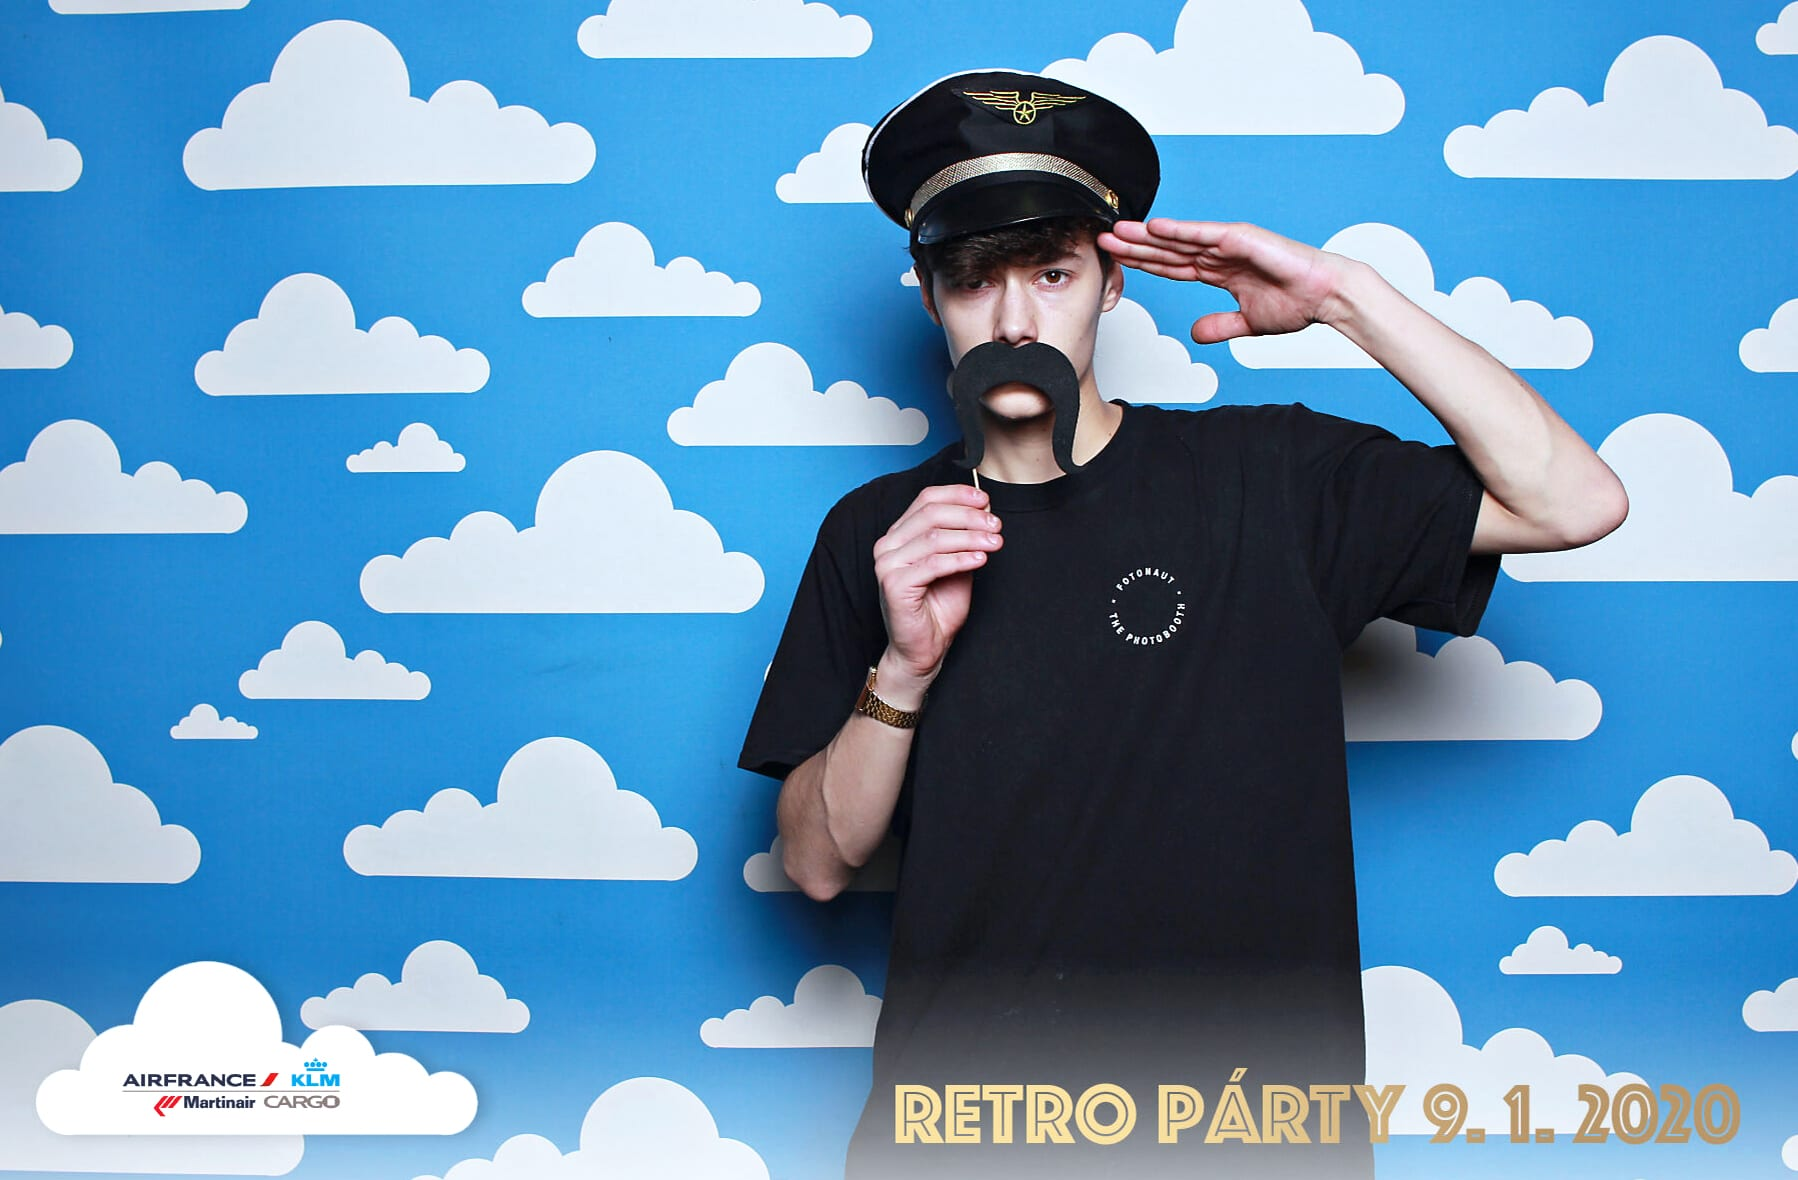 fotokoutek-firemni-vecirek-praha-cargo-9-1-2020-708248